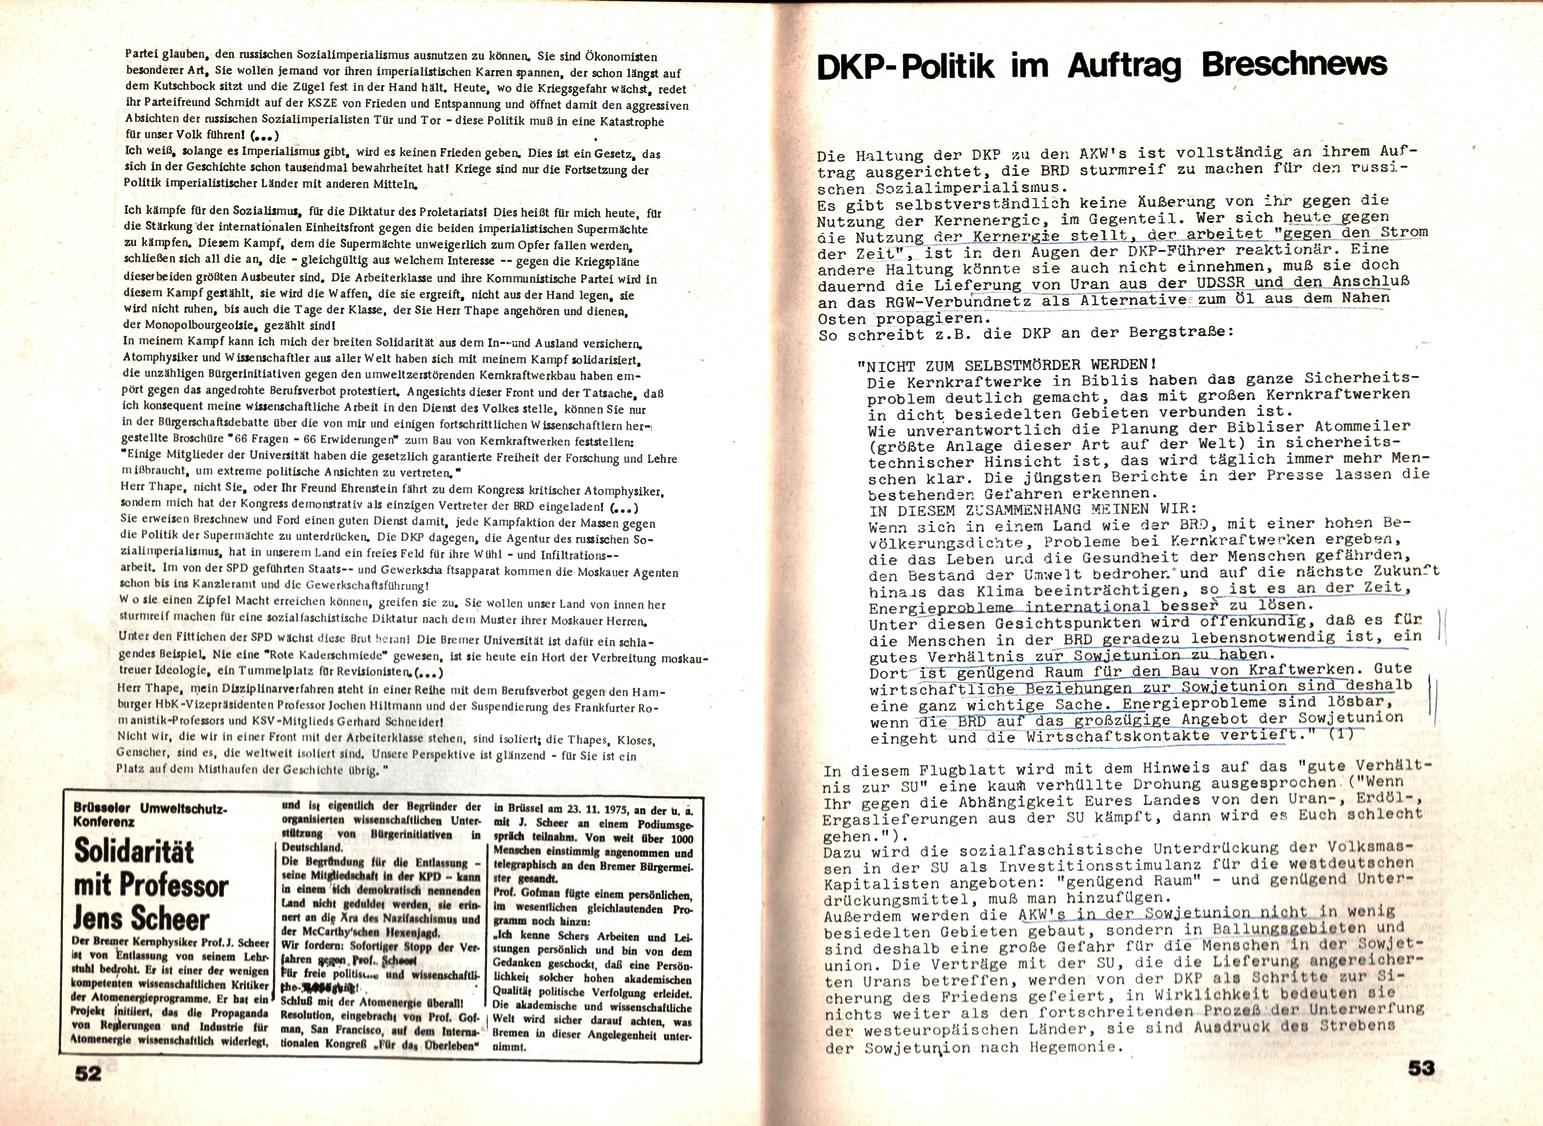 KSV_1976_Atomenergie_im_Kapitalismus_028